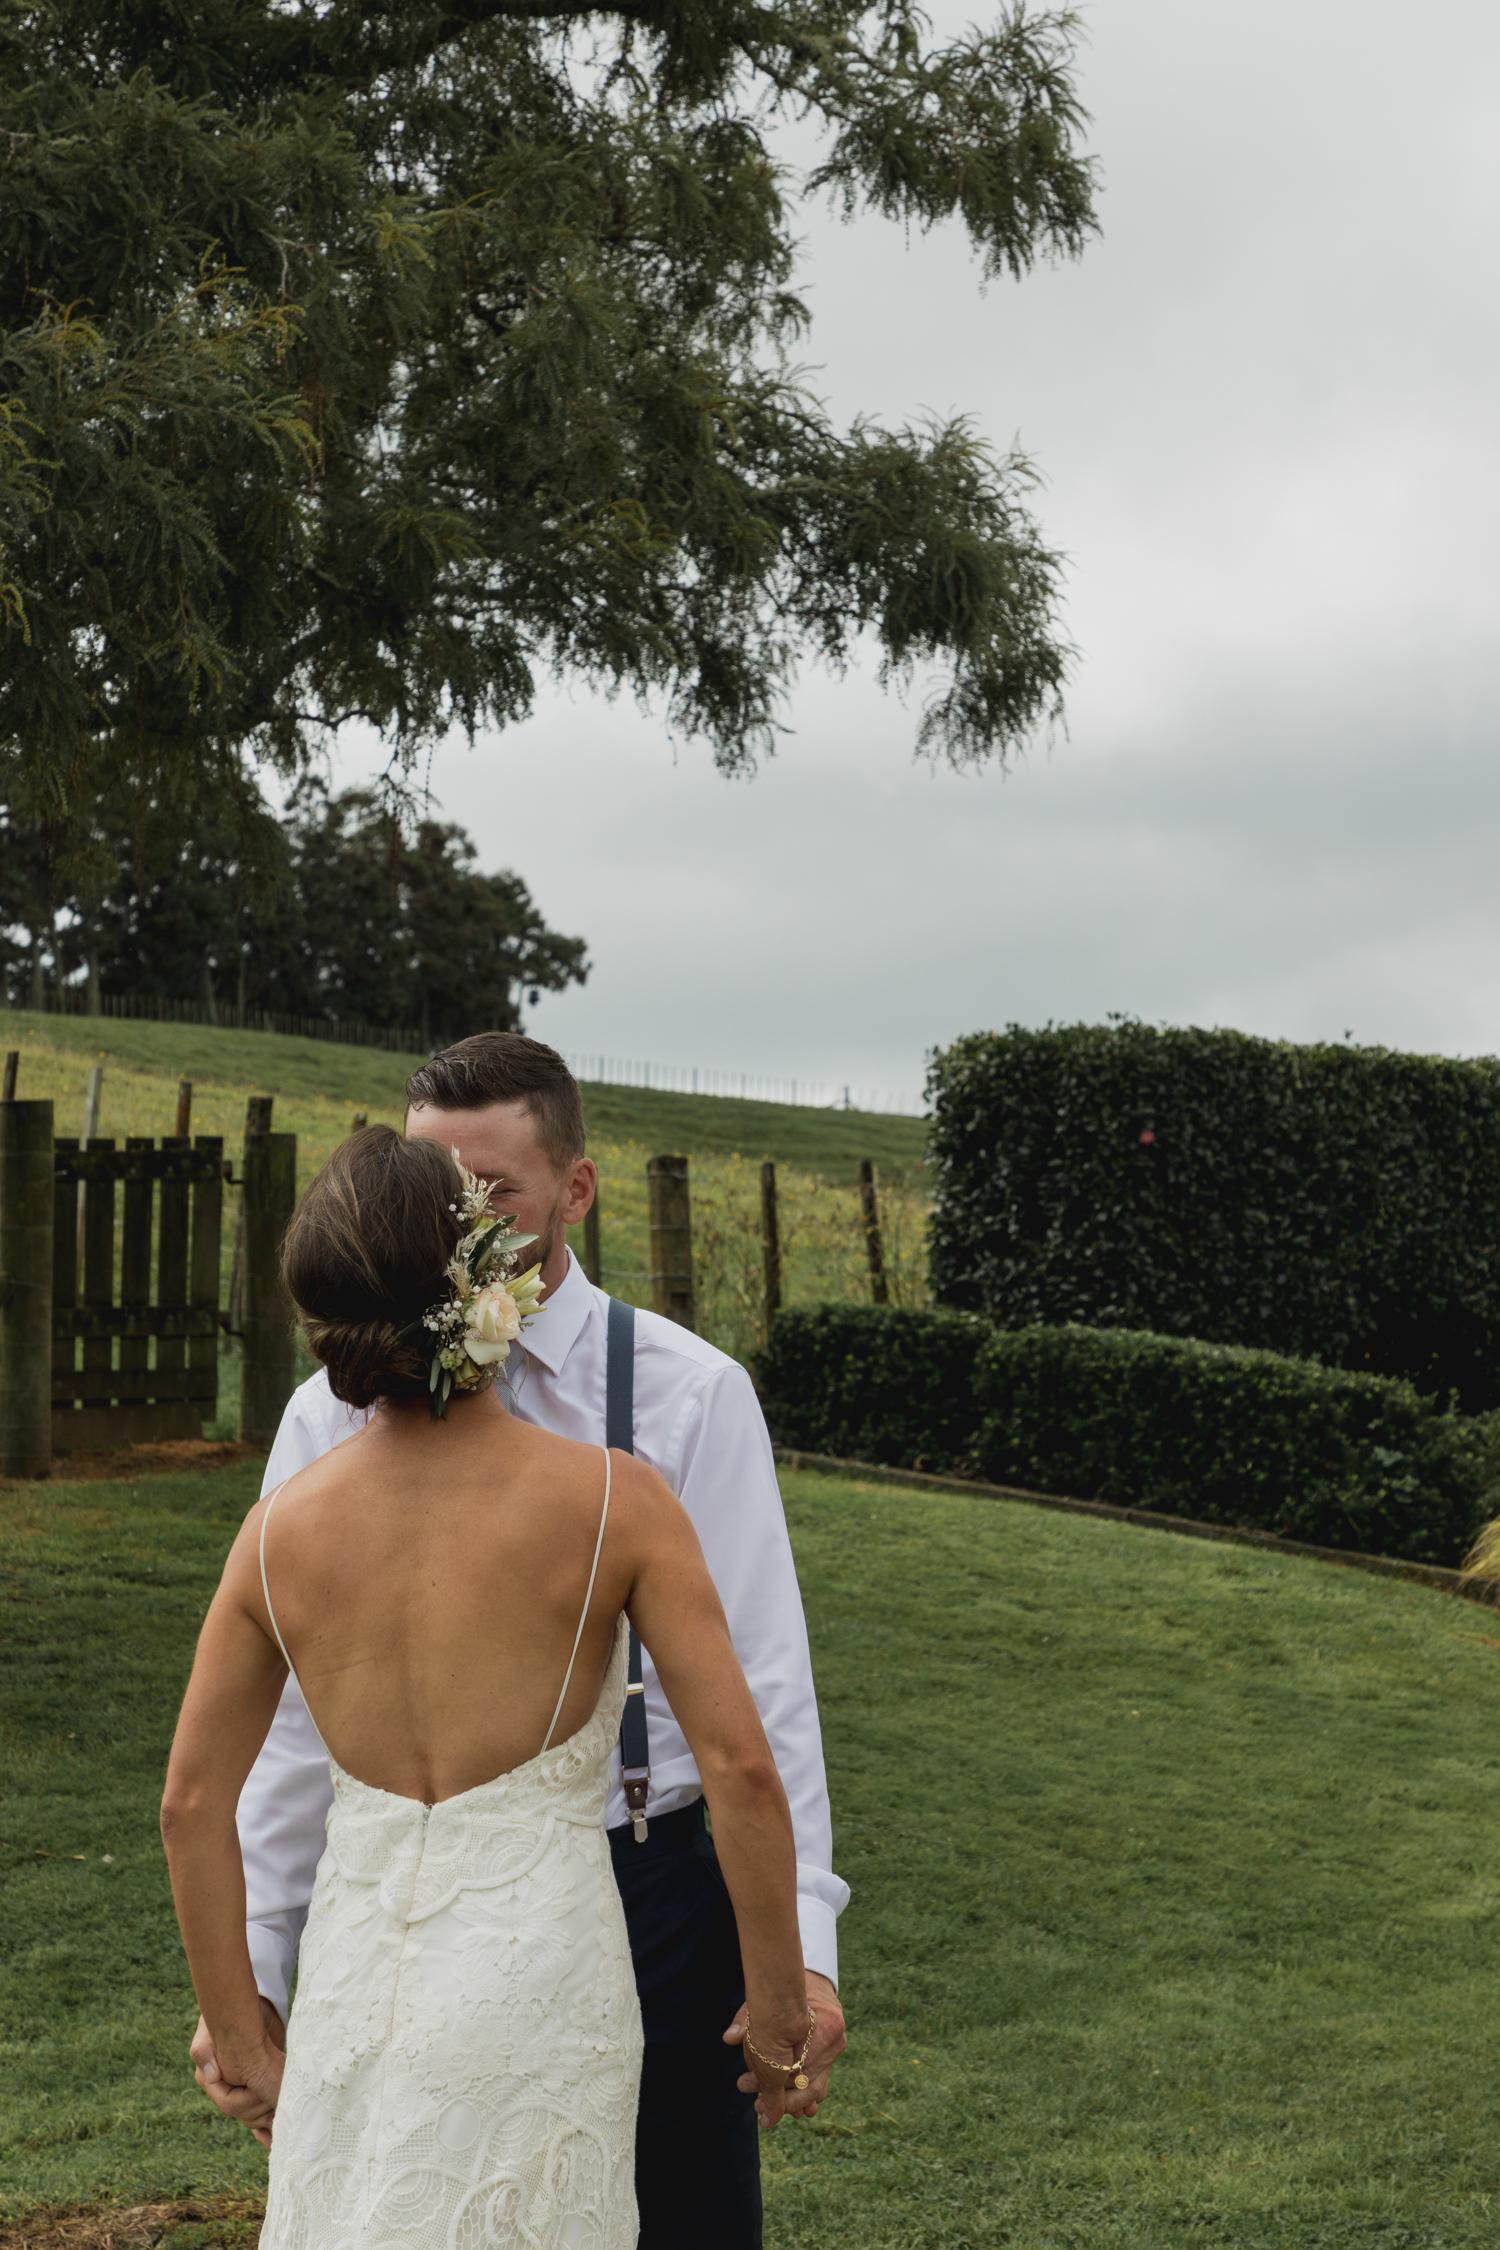 wedding-at-the-red-barn-new-zealand-wedding-photographer-groom-kissing-his-bride.jpg